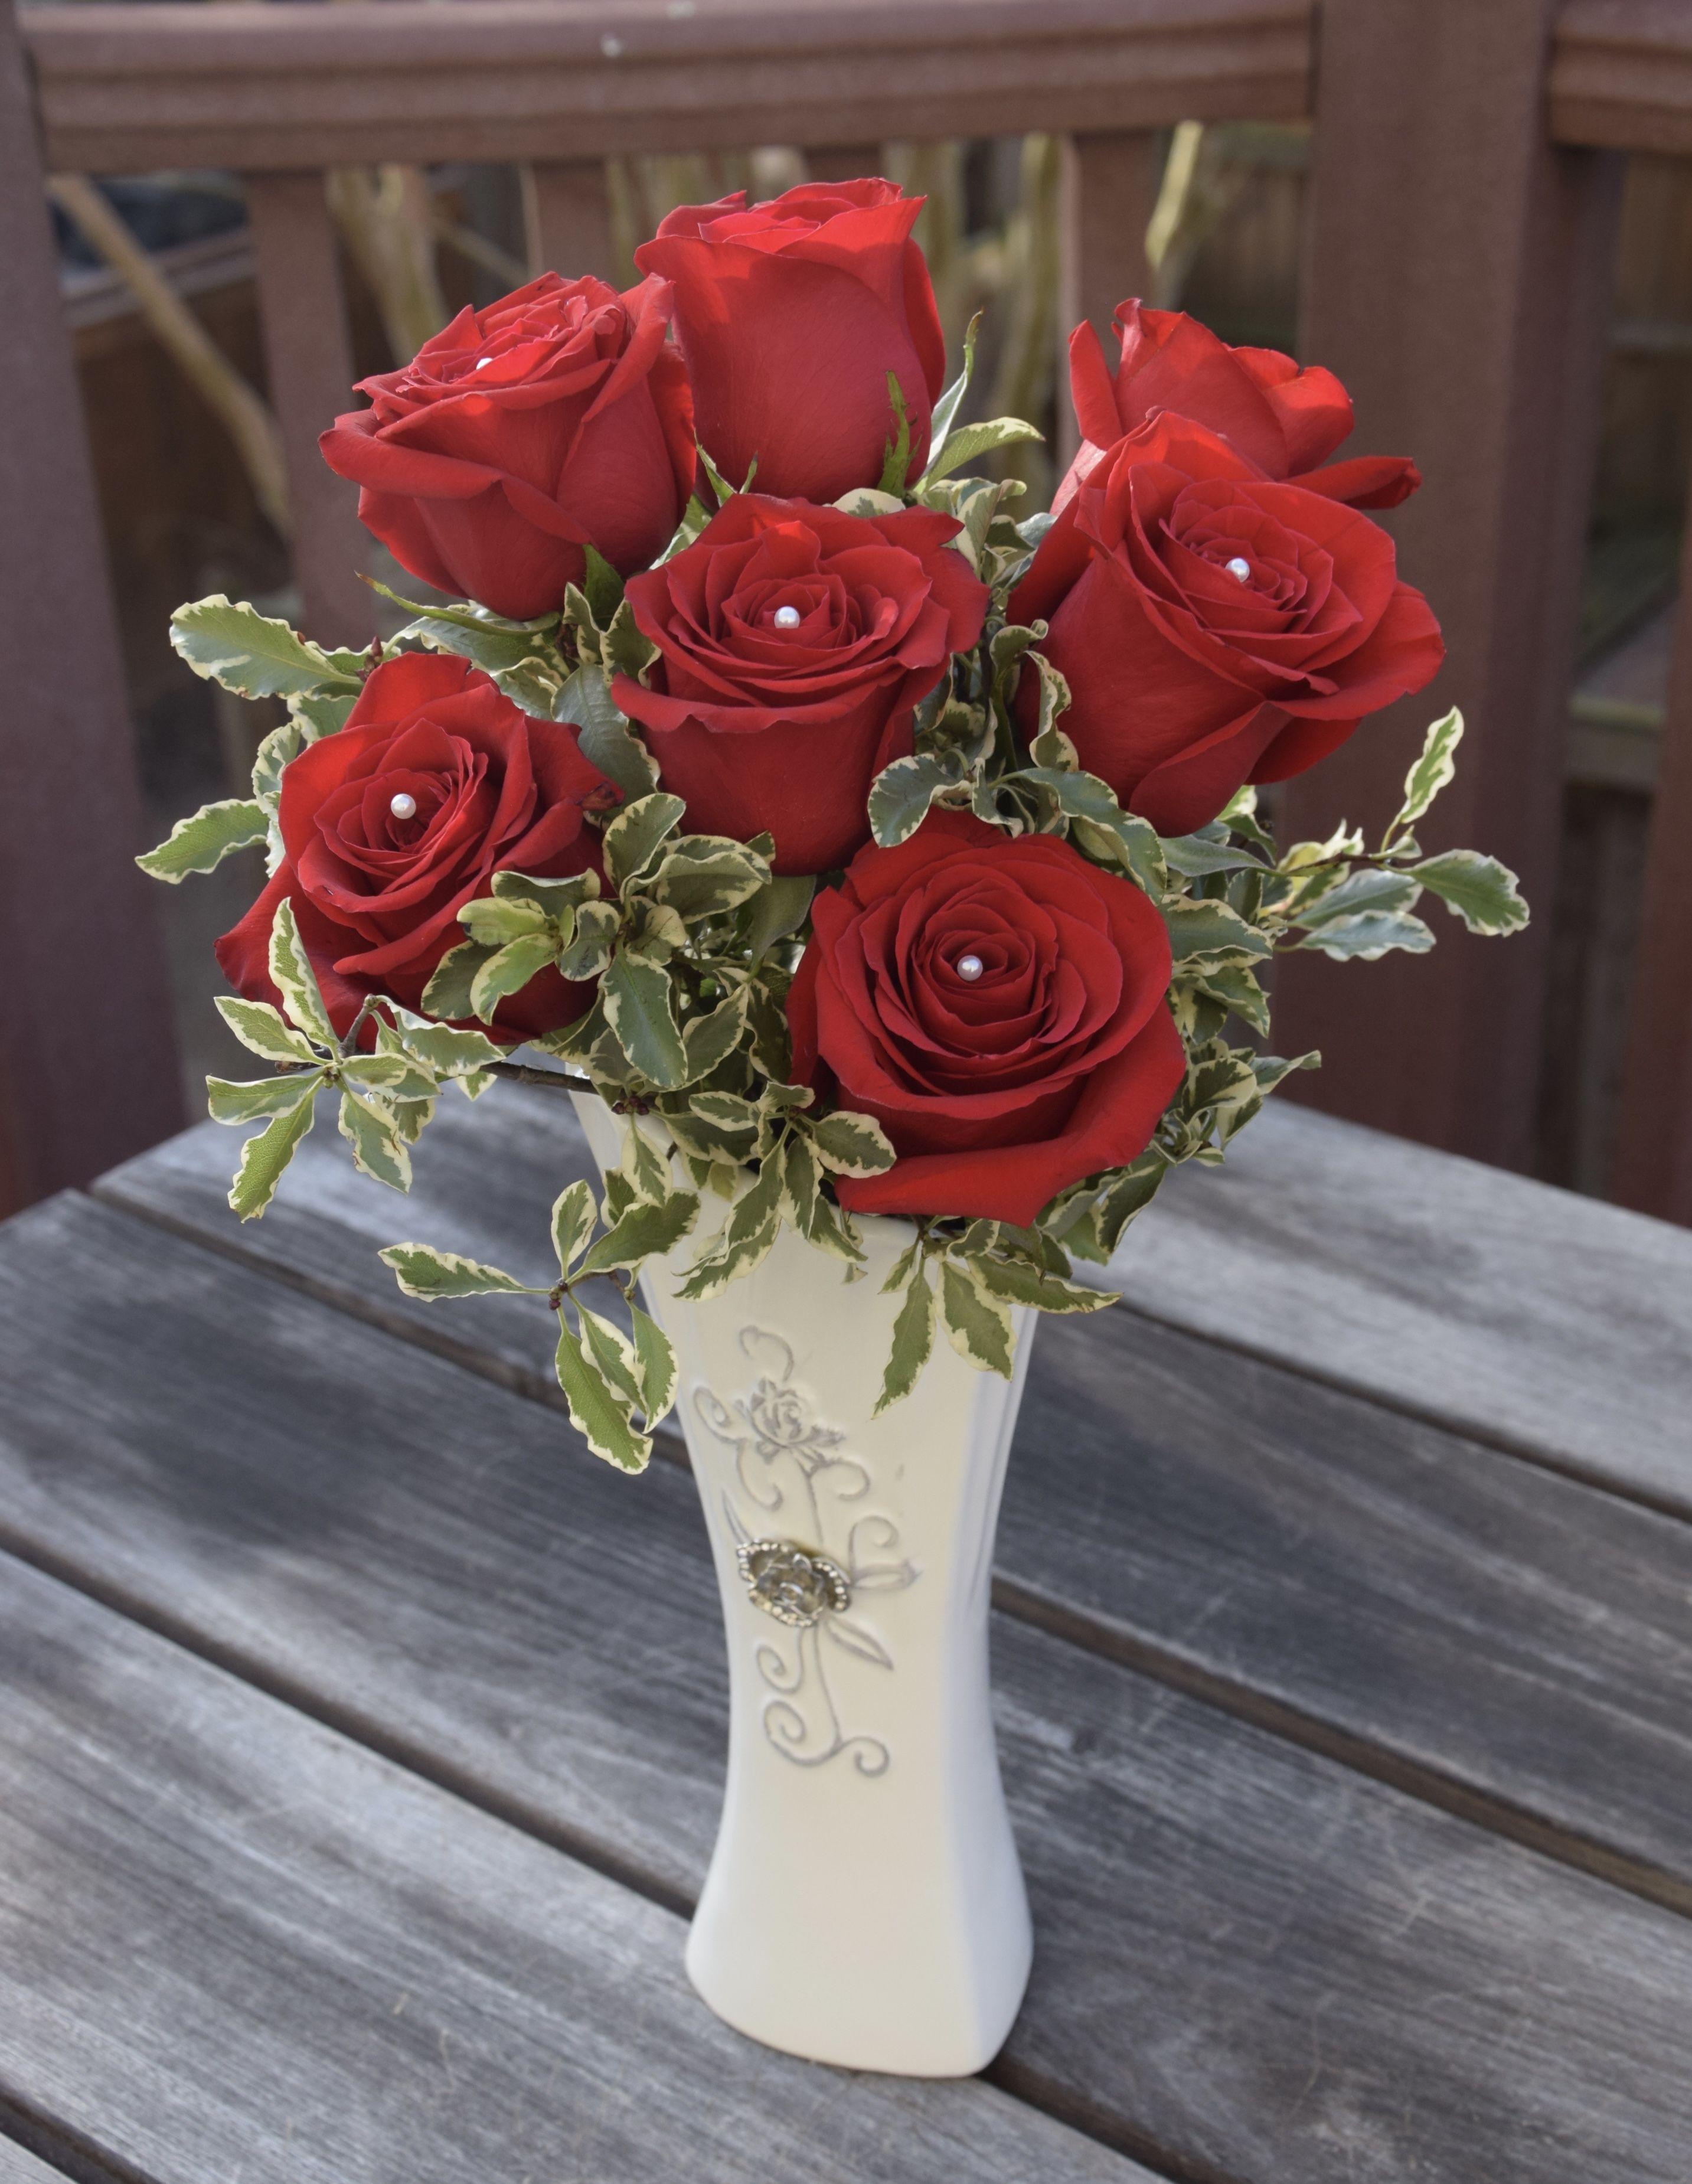 Half Dozen Red Roses Flower Arrangement Flower Arrangements Fresh Flowers Arrangements Red Roses